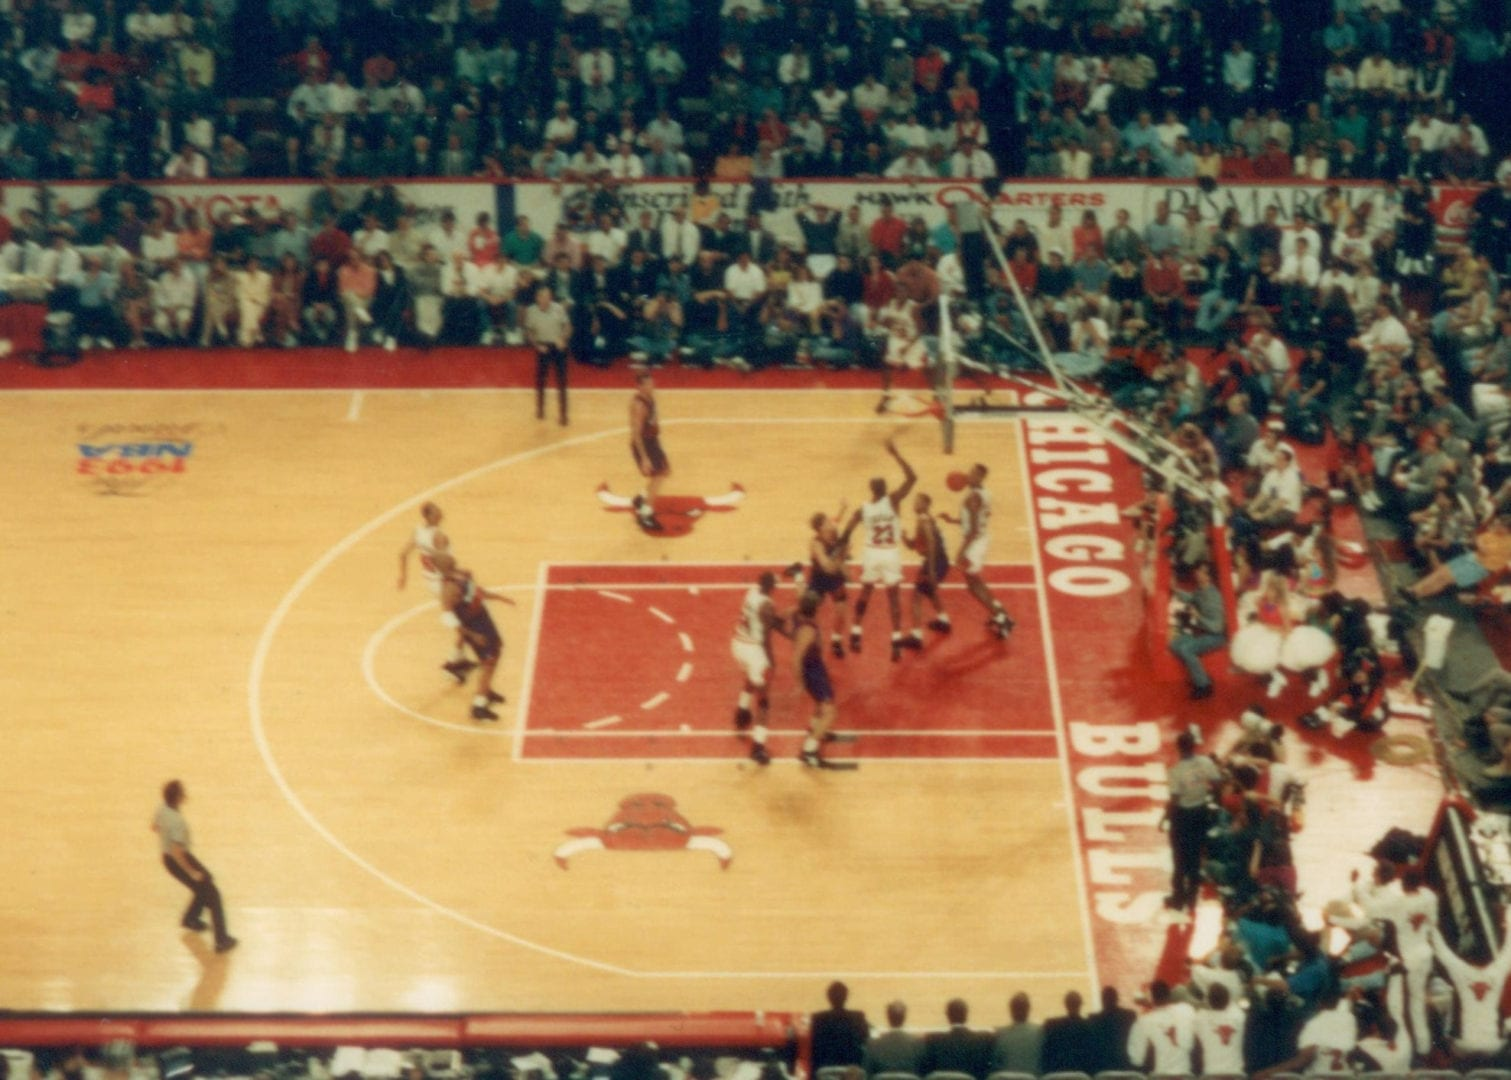 A basketball game fo Chicago Bulls vs Phoenix Suns